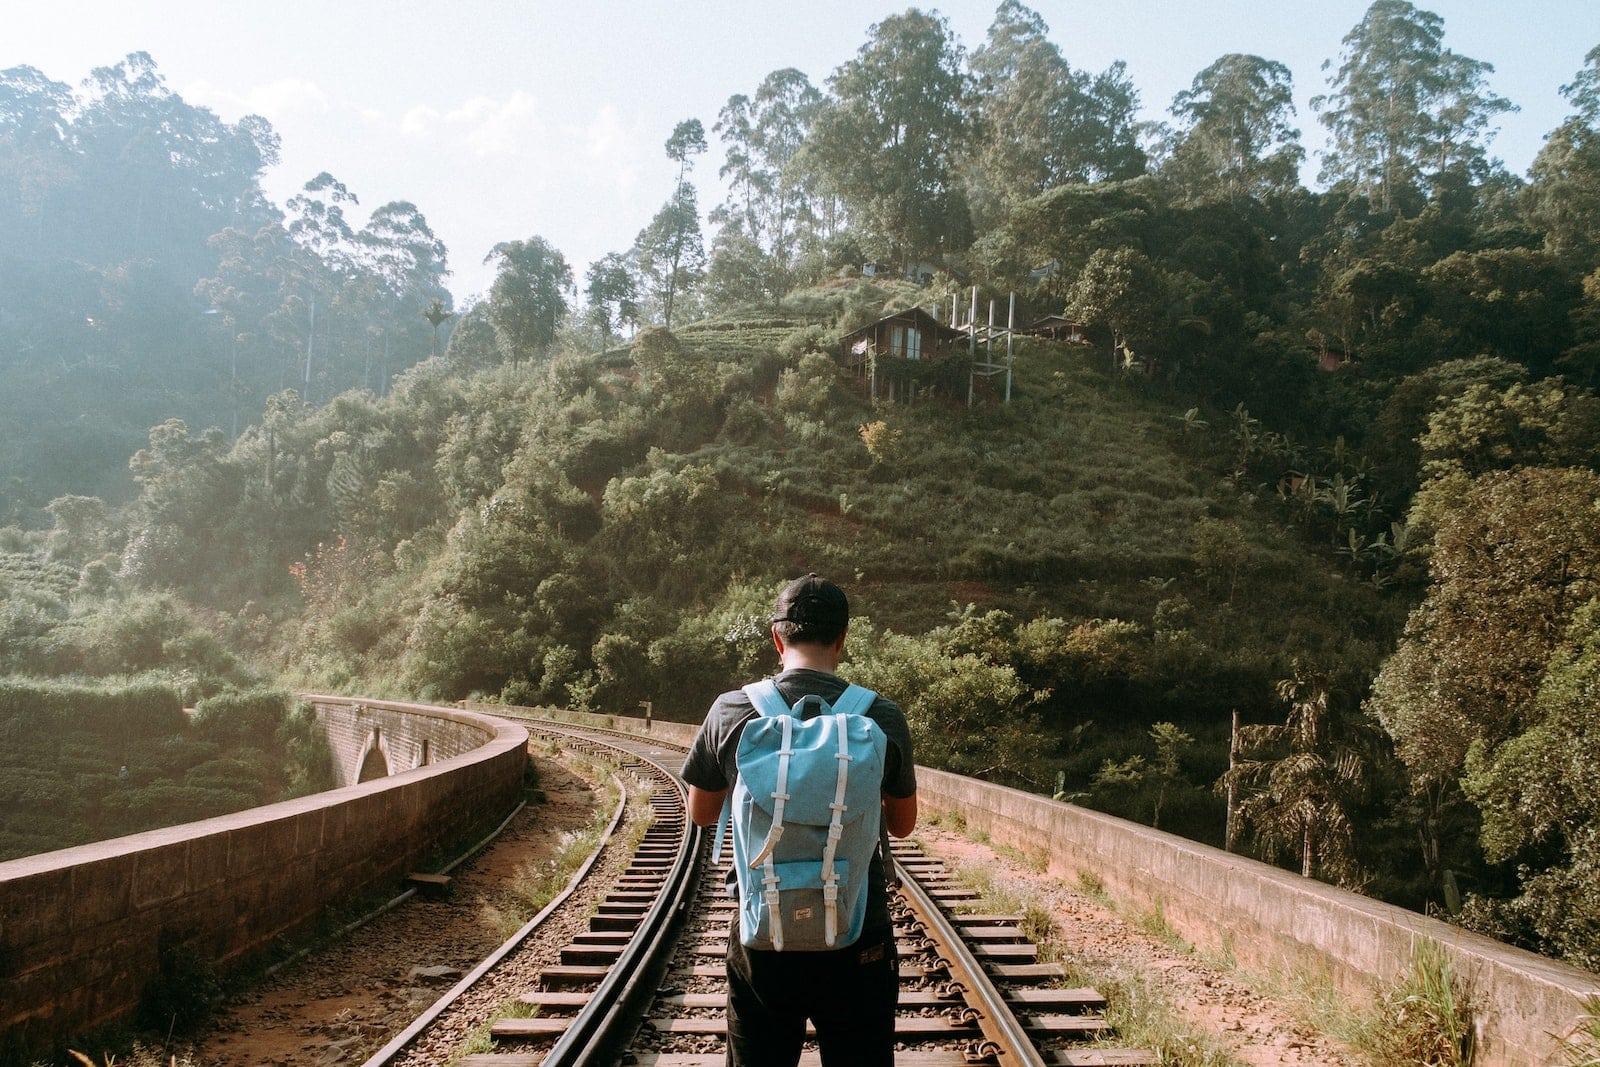 A man walks along train tracks wearing a blue backpack